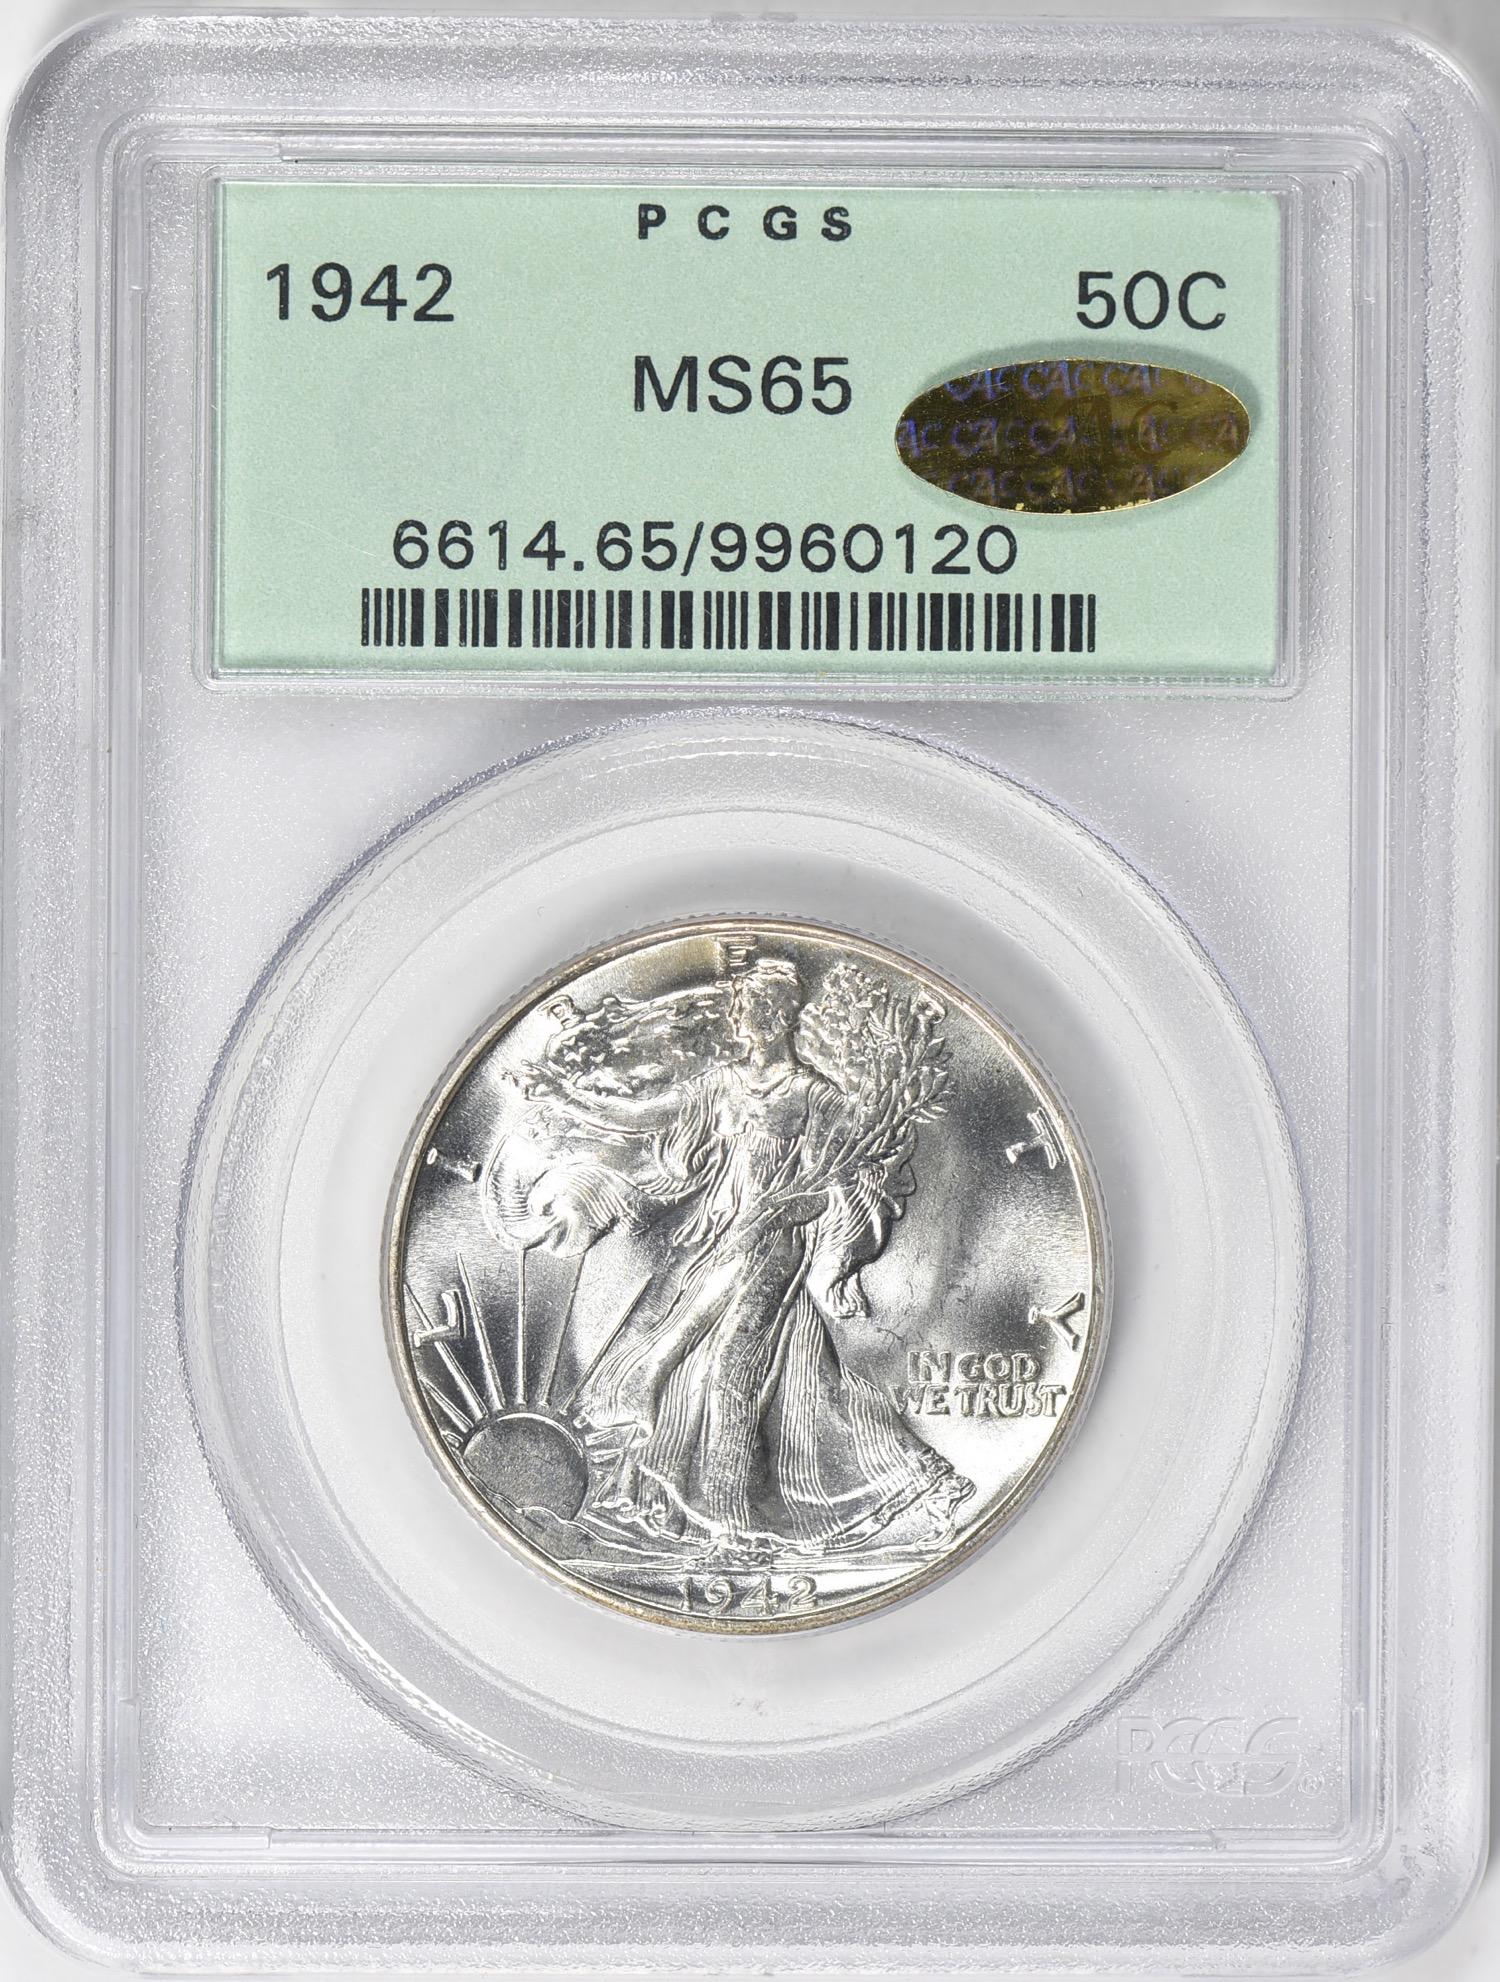 1942 9960120 Obverse MS65 CAC(Gold) OGH.jpg